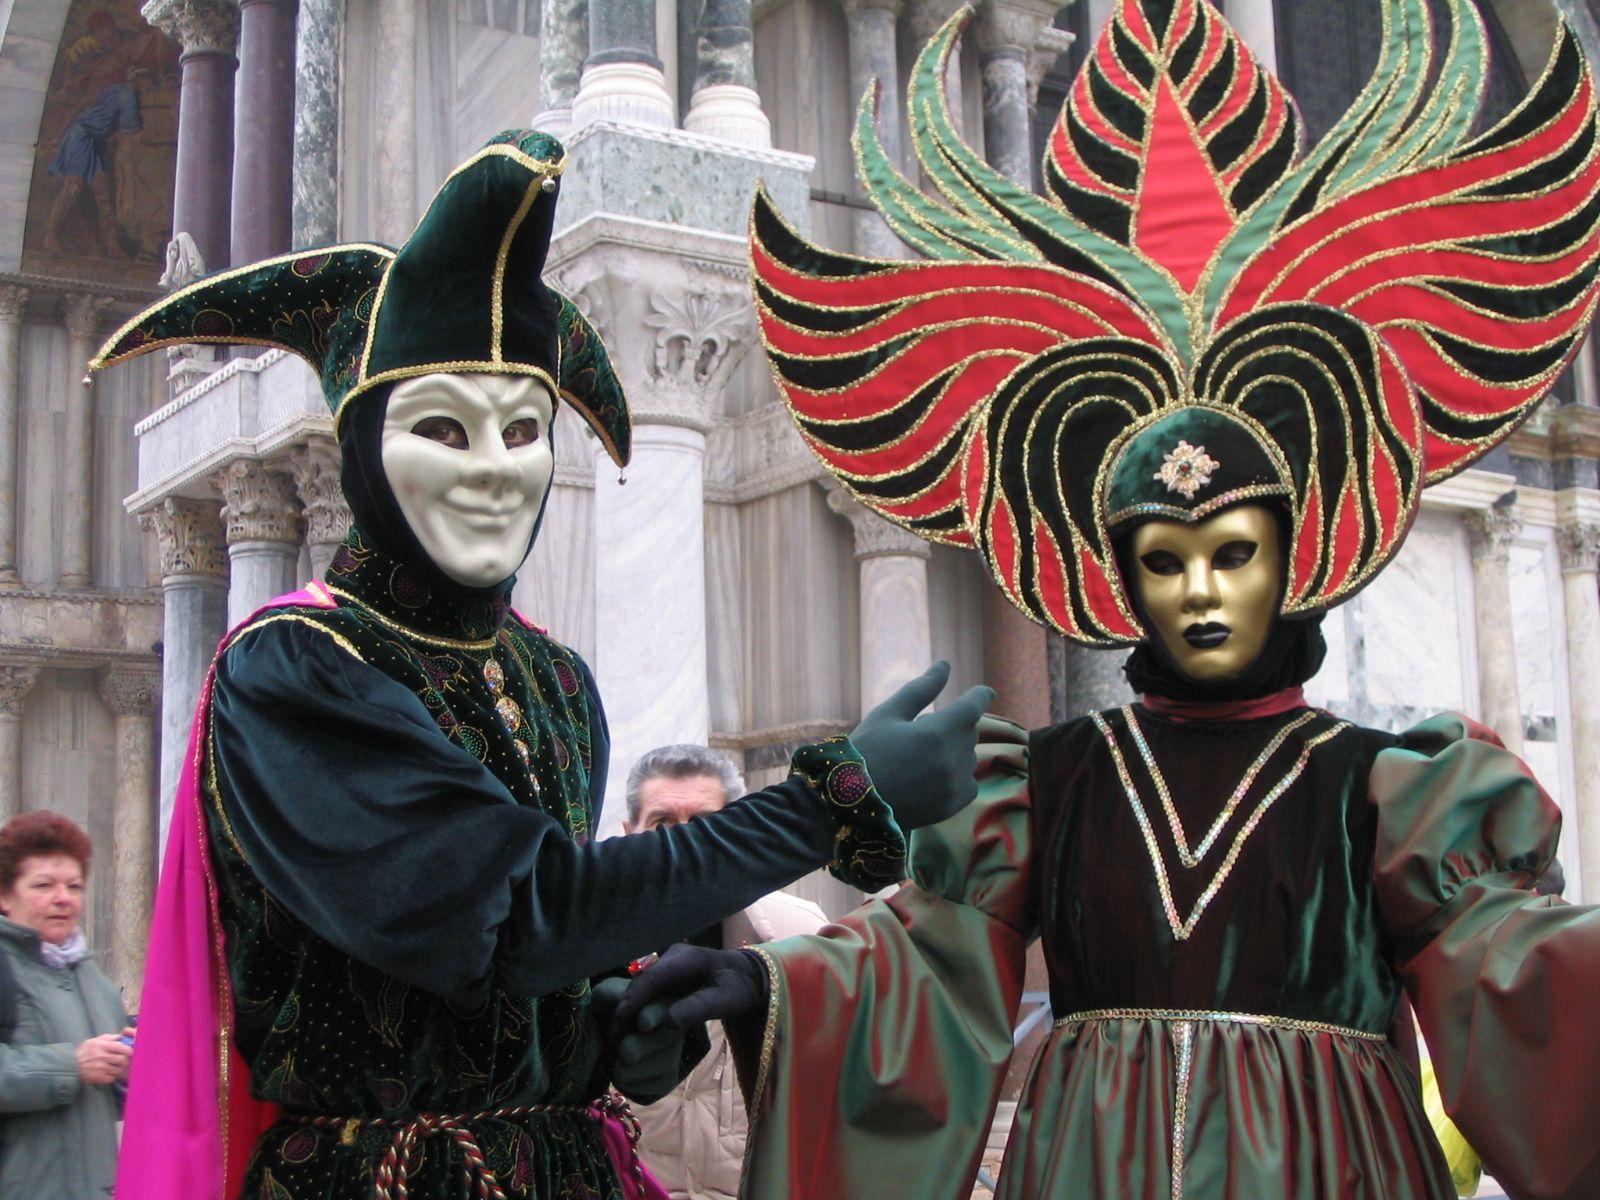 FileVenezia Carnevale 7jpg Wikimedia Commons